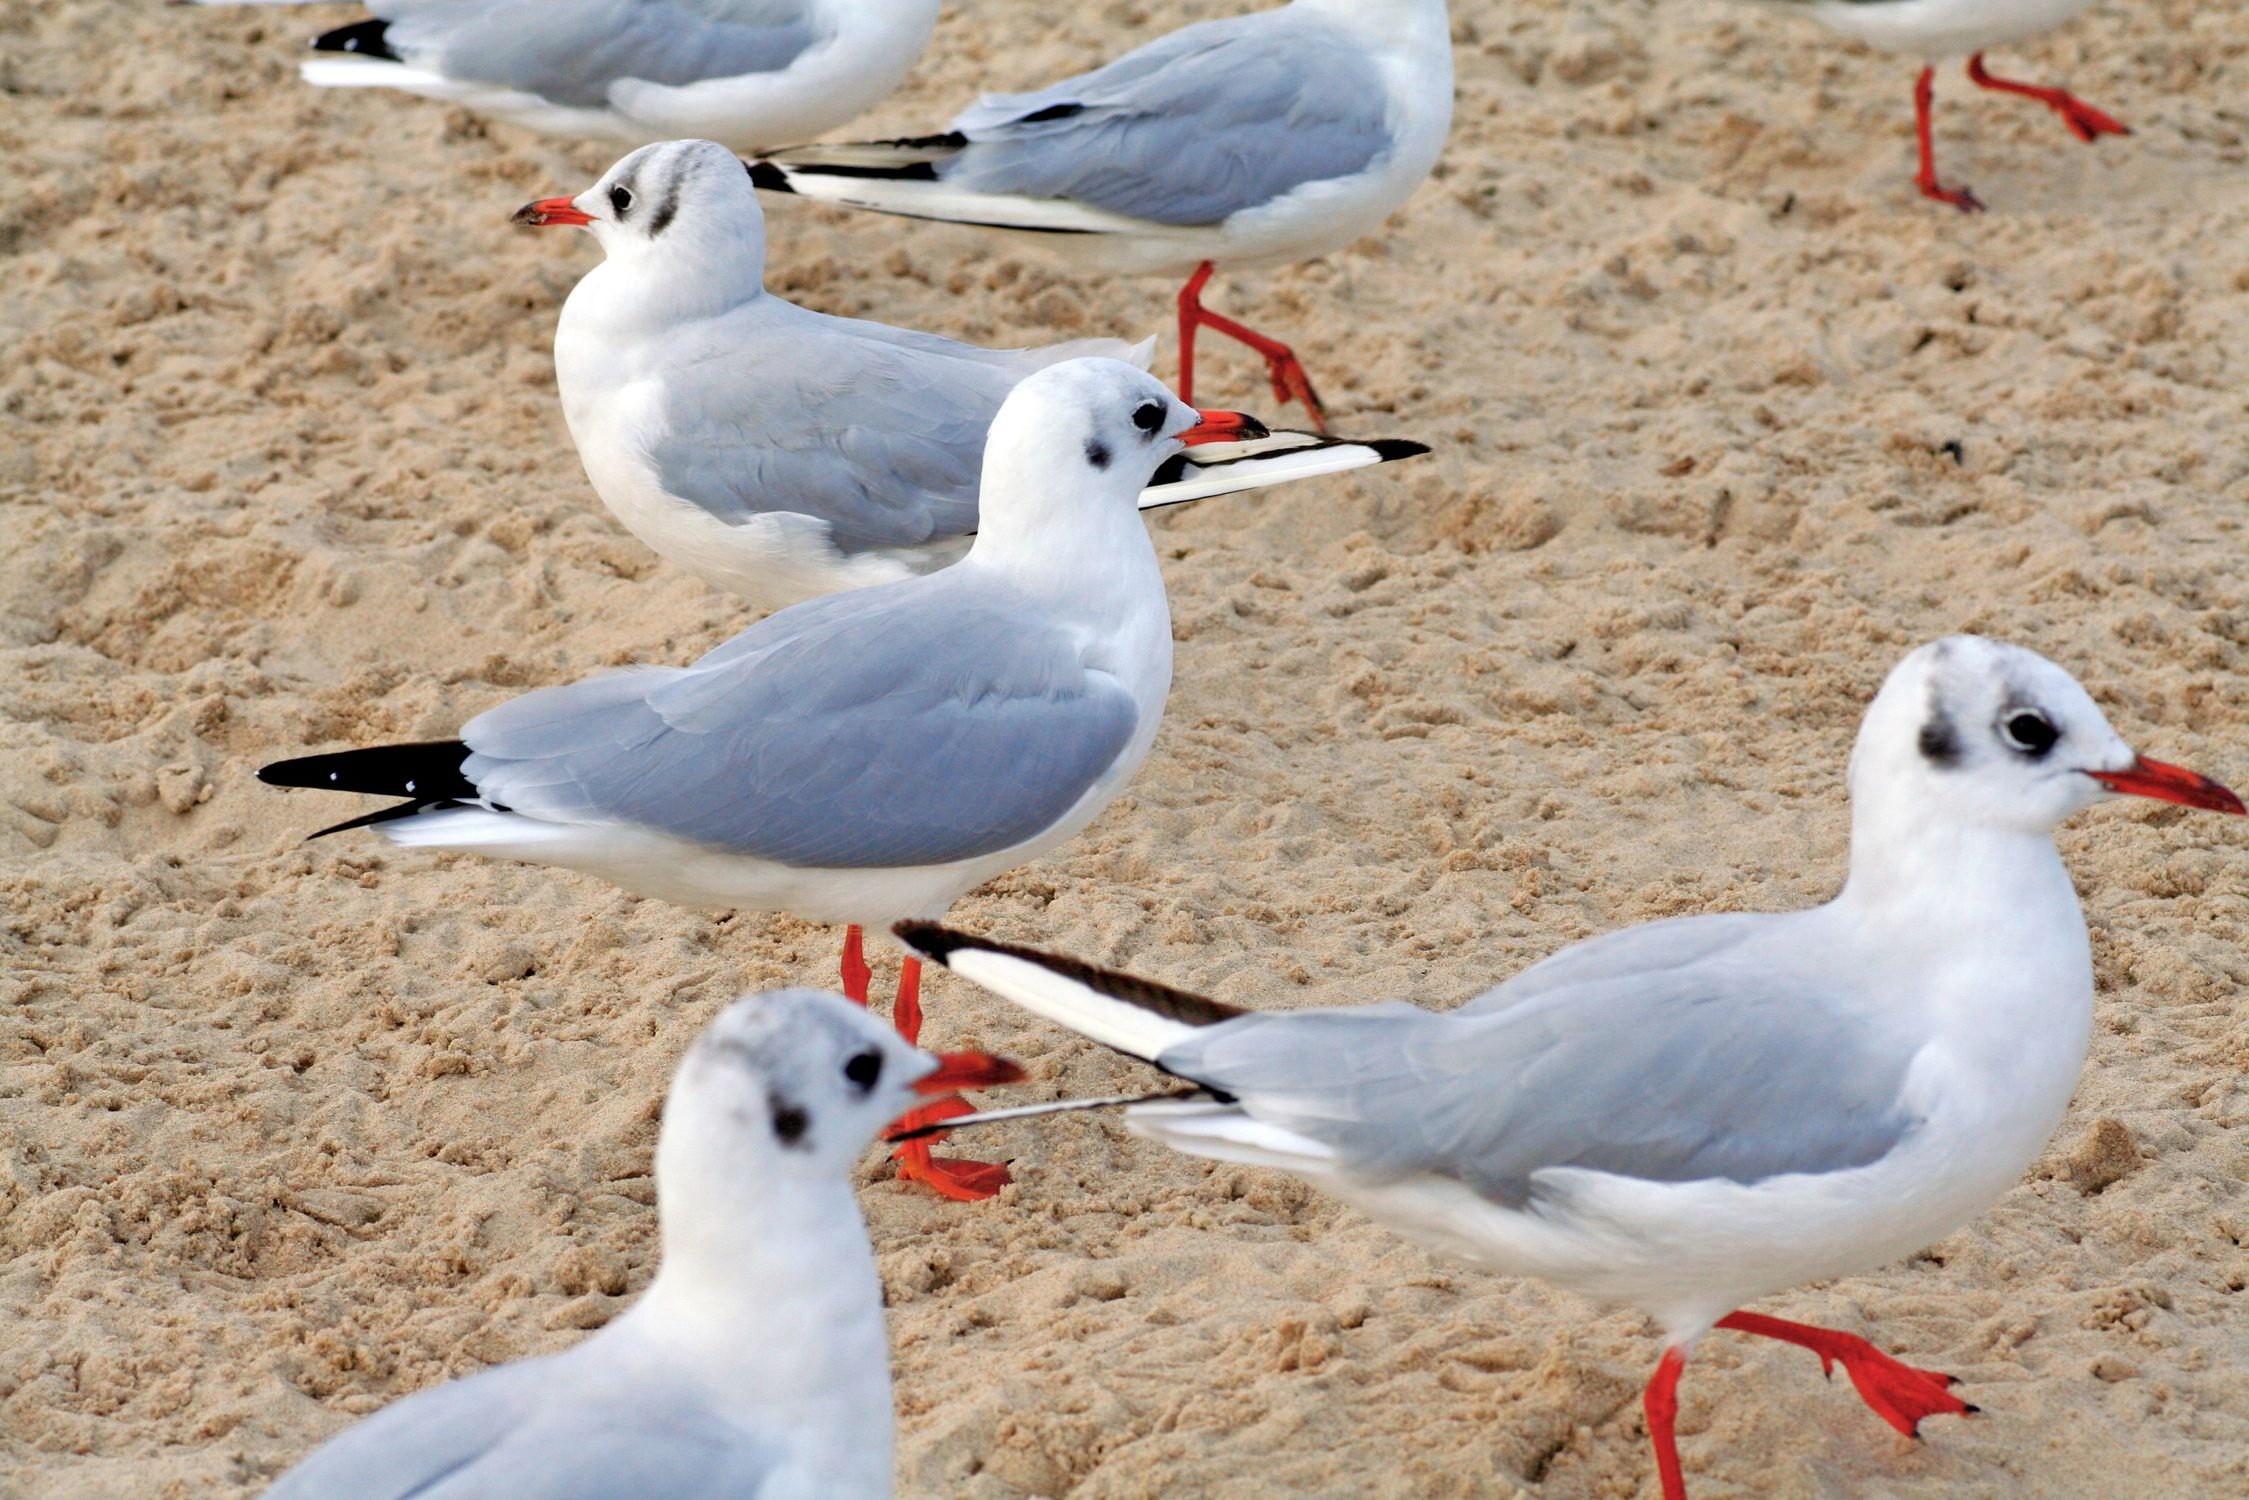 Bild mit Tiere, Vögel, Vögel, Wasservögel, Möwen, Tier, Möwe, Möwe am Strand, Möwen am Strand, Möwenvögel, Möwenvögel, Watvögel